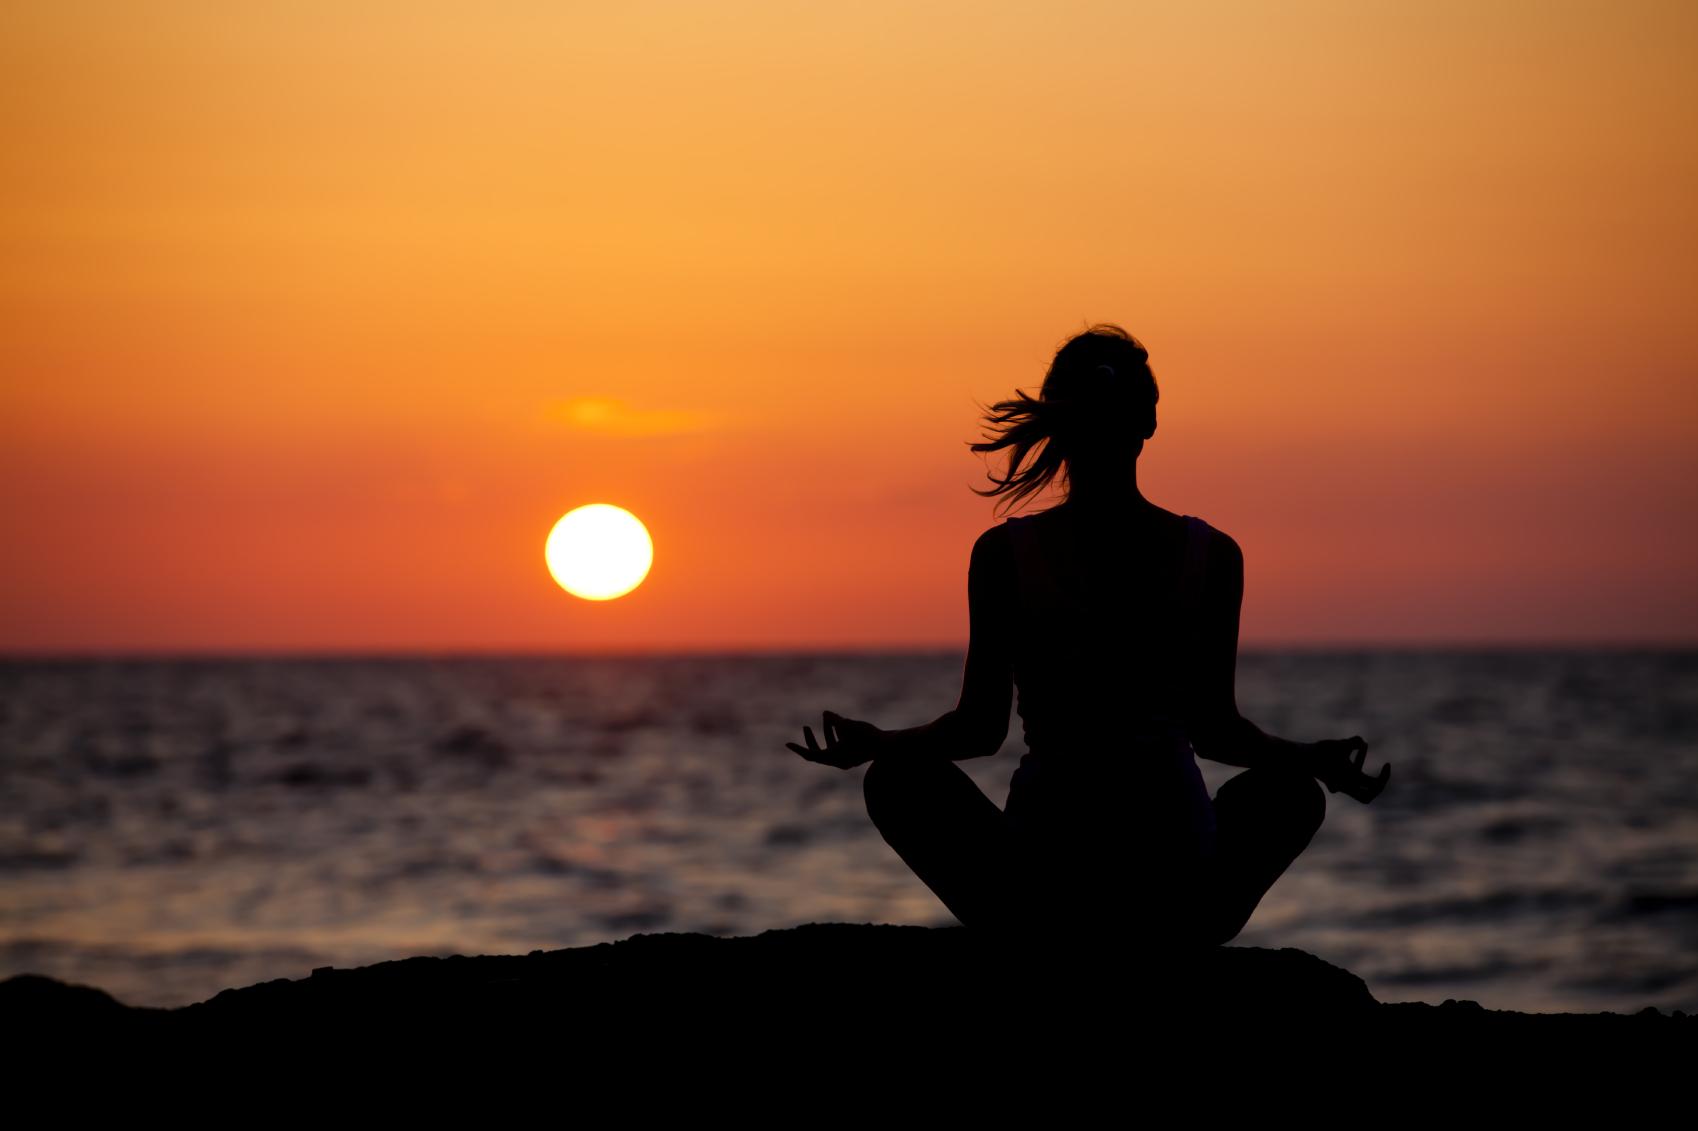 14 Wonderful HD Meditation Wallpapers - HDWallSource.com